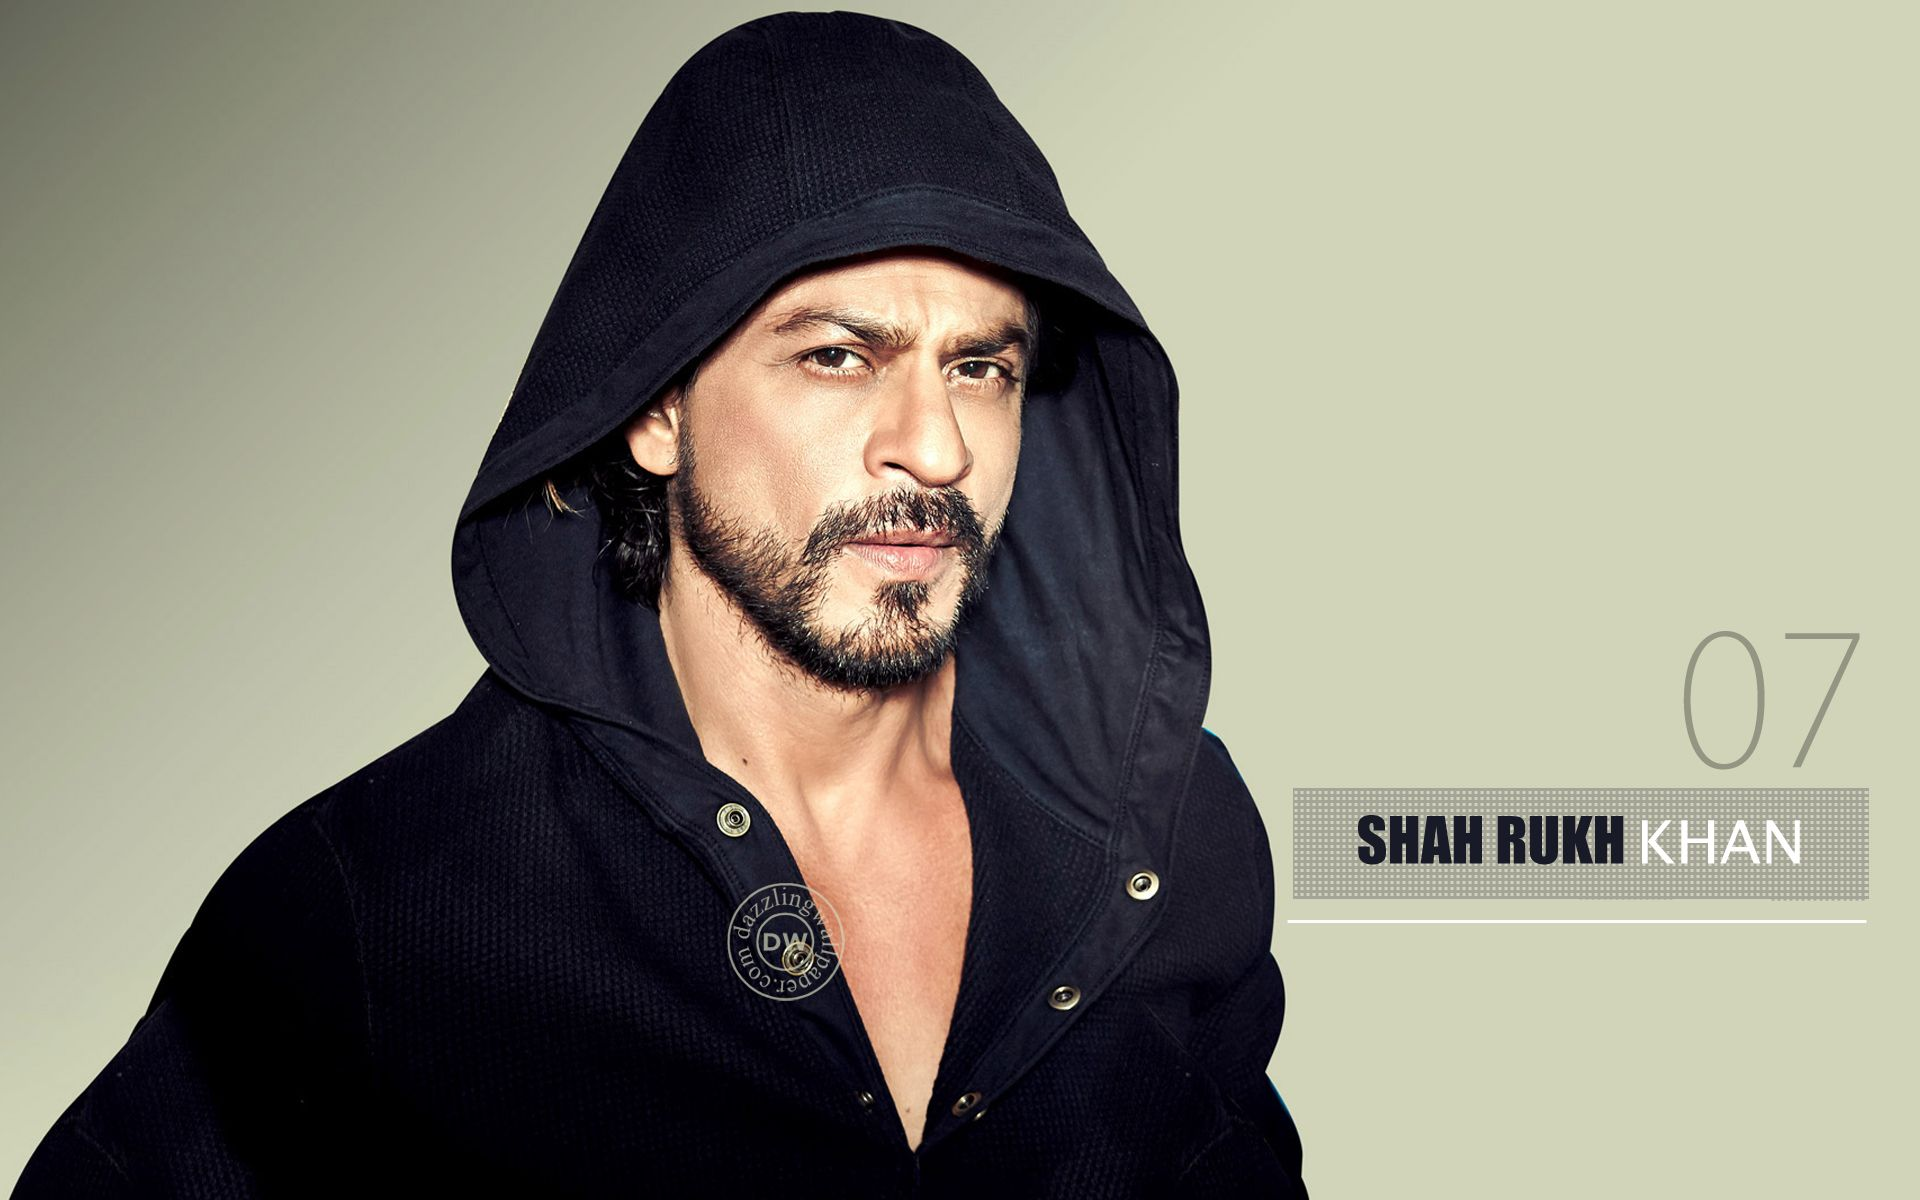 shah rukh khan bollywood king hd wallpaper shahrukh khan, bollywood